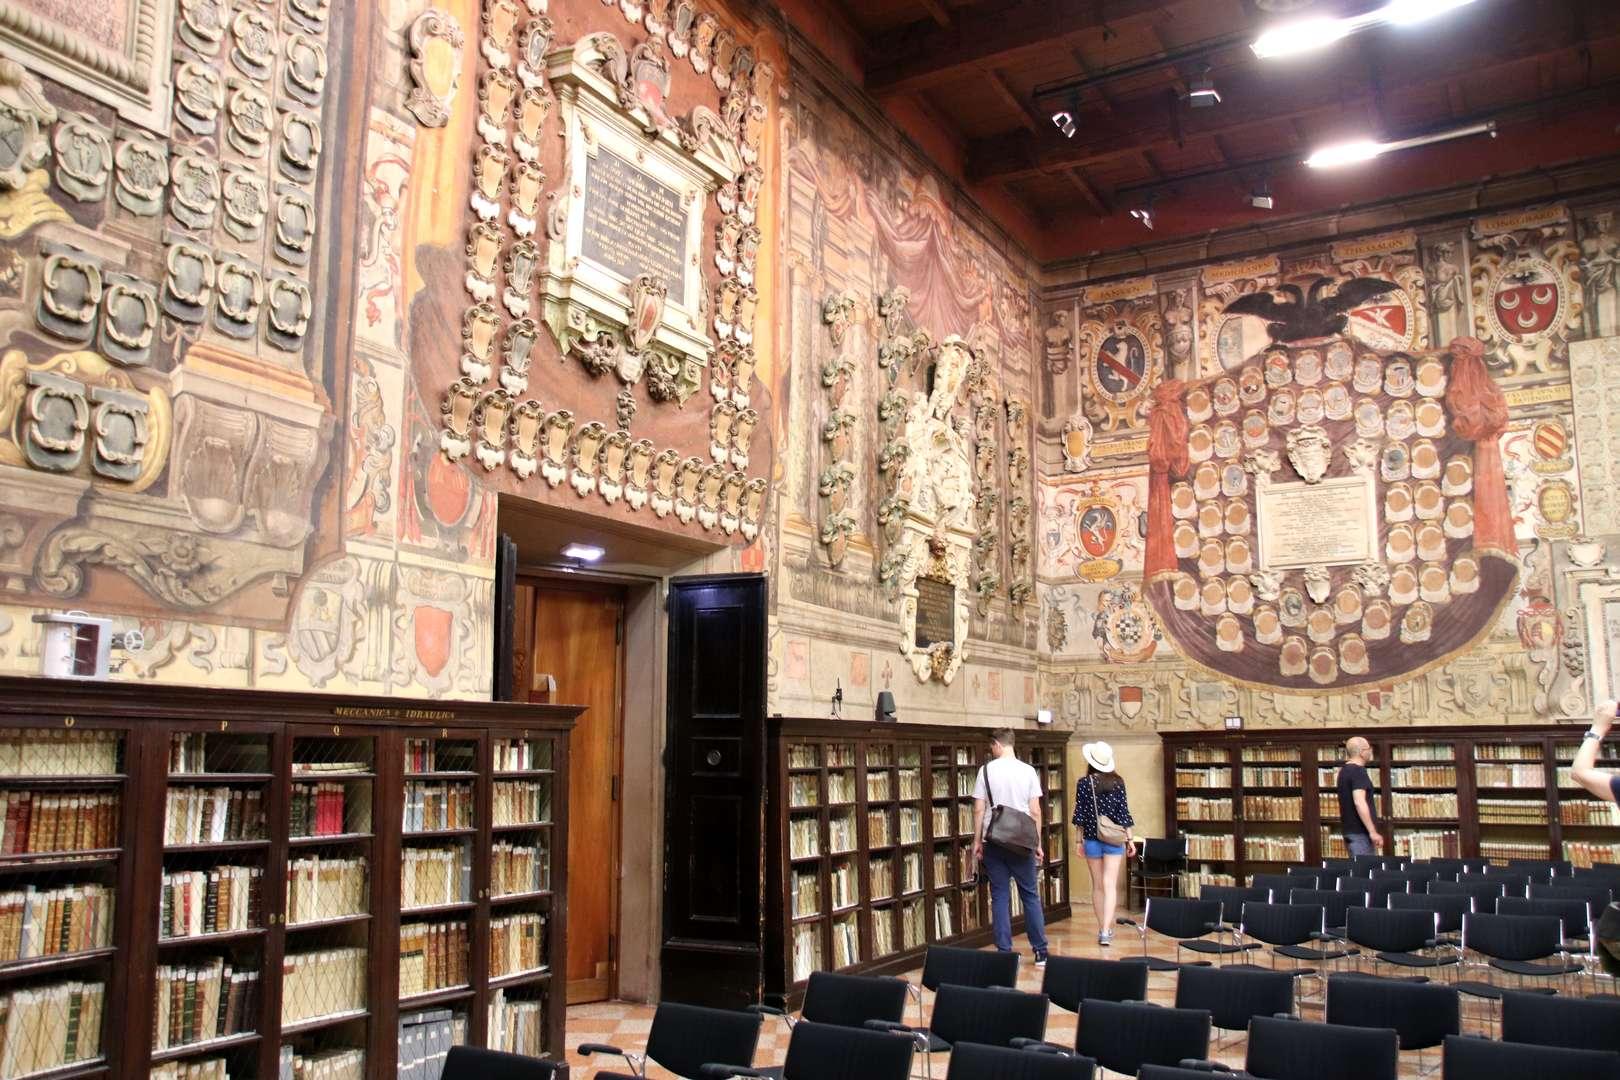 Italie - Pallazo Dell' Archiginnasio, ancien siège de l'université de Bologne